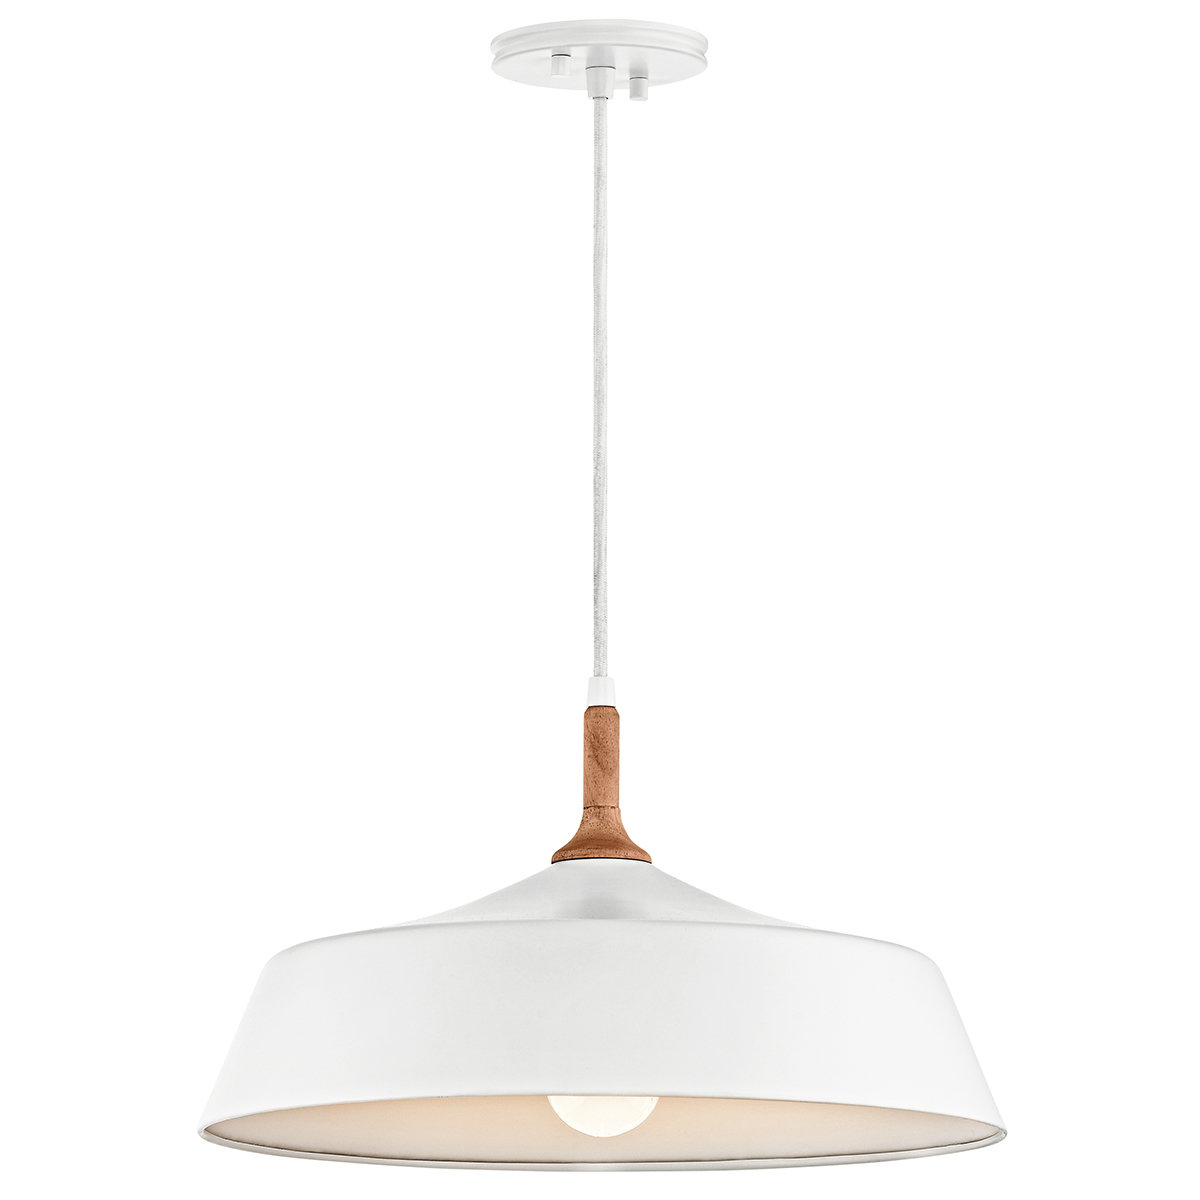 Evelyn 1 Light Single Dome Pendant For Popular 1 Light Single Dome Pendants (Gallery 9 of 25)